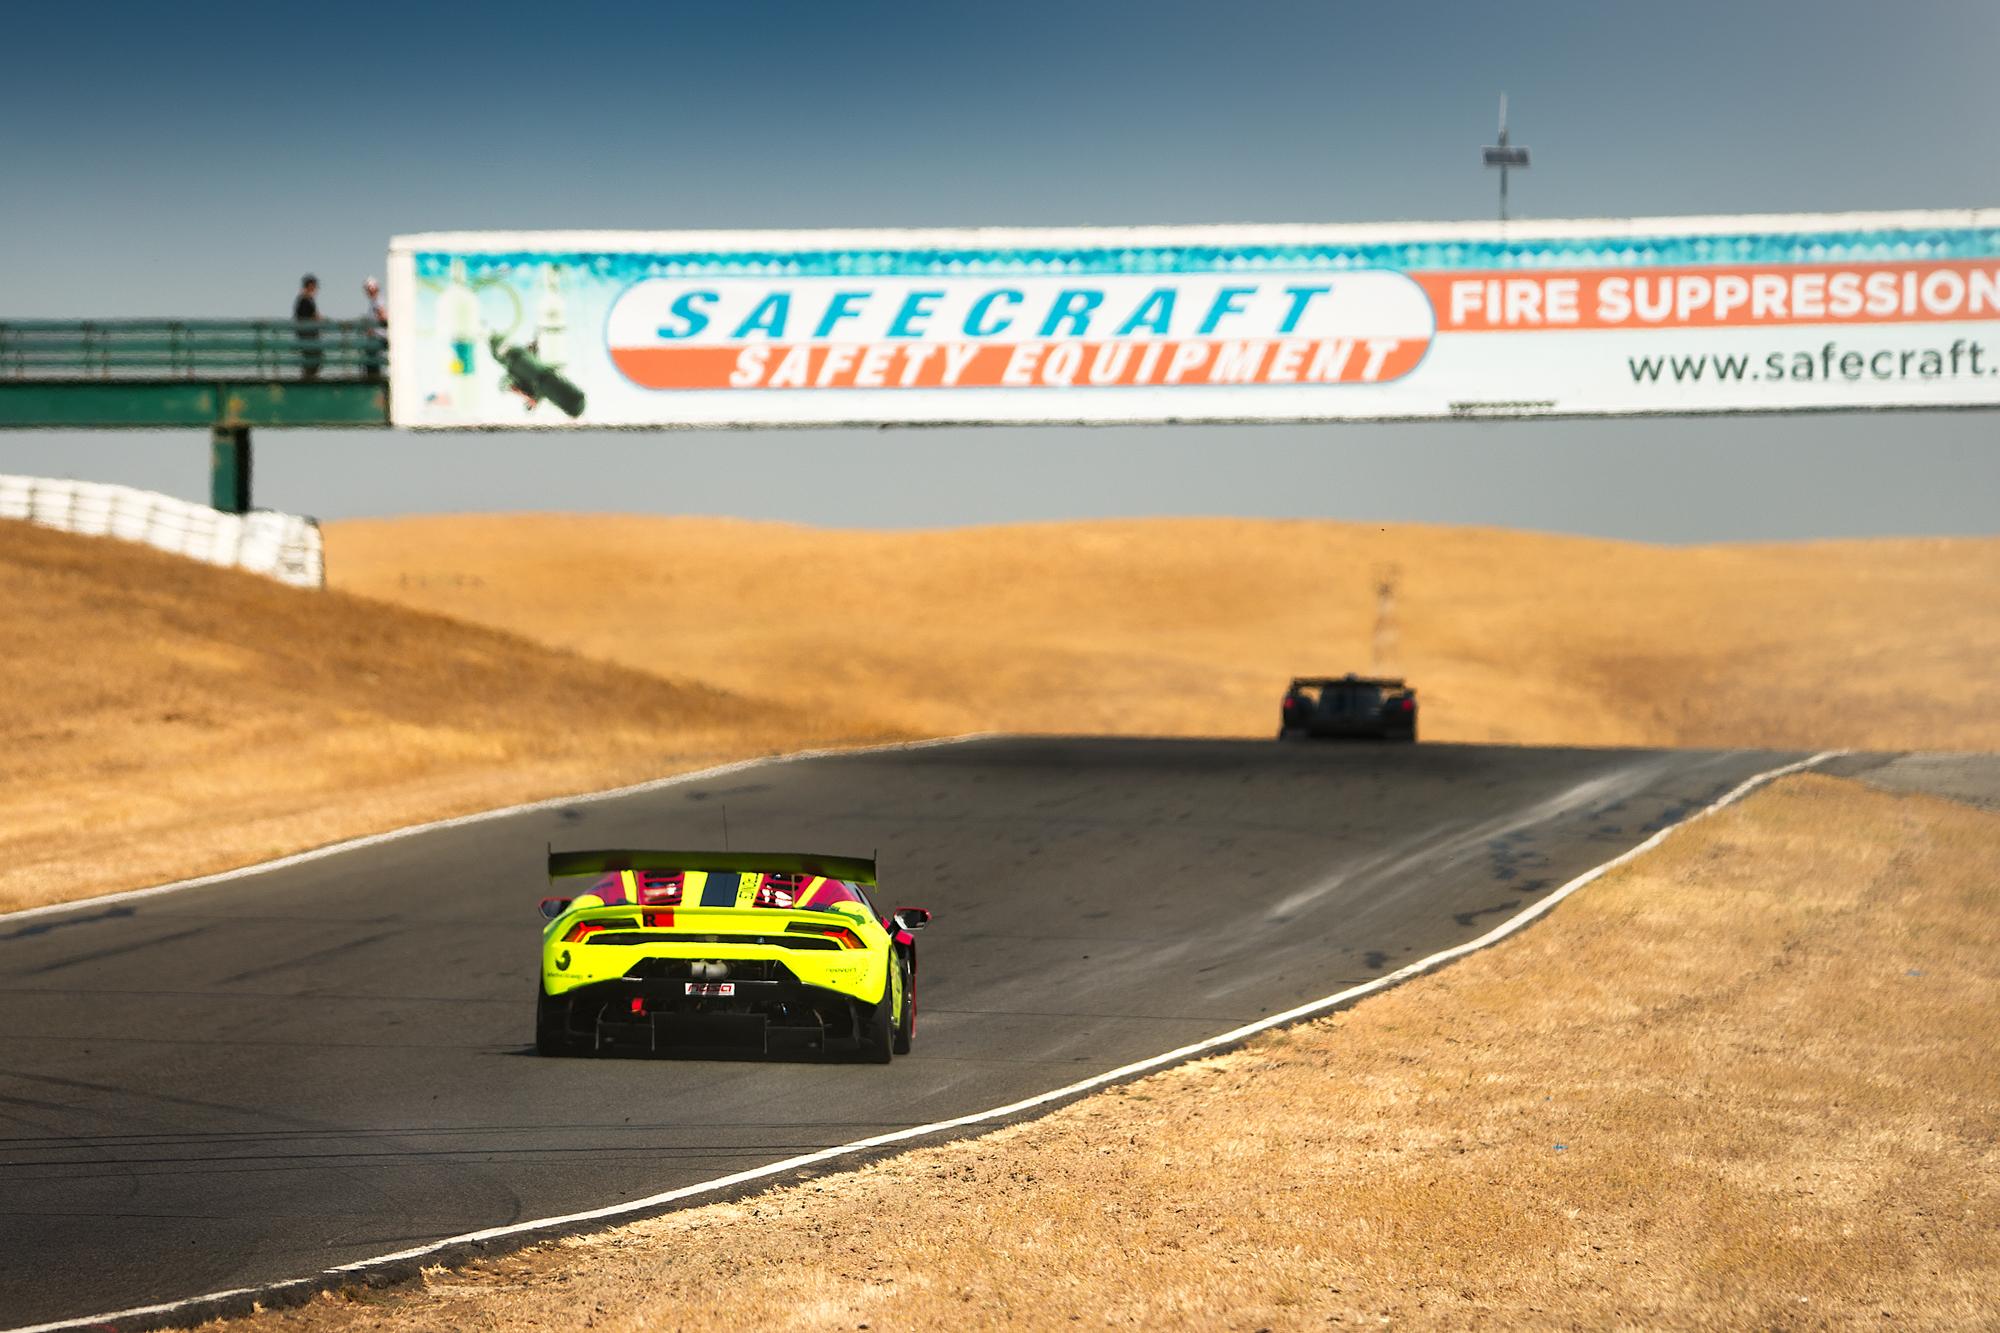 Steven-Racing-20171007-45307.jpg